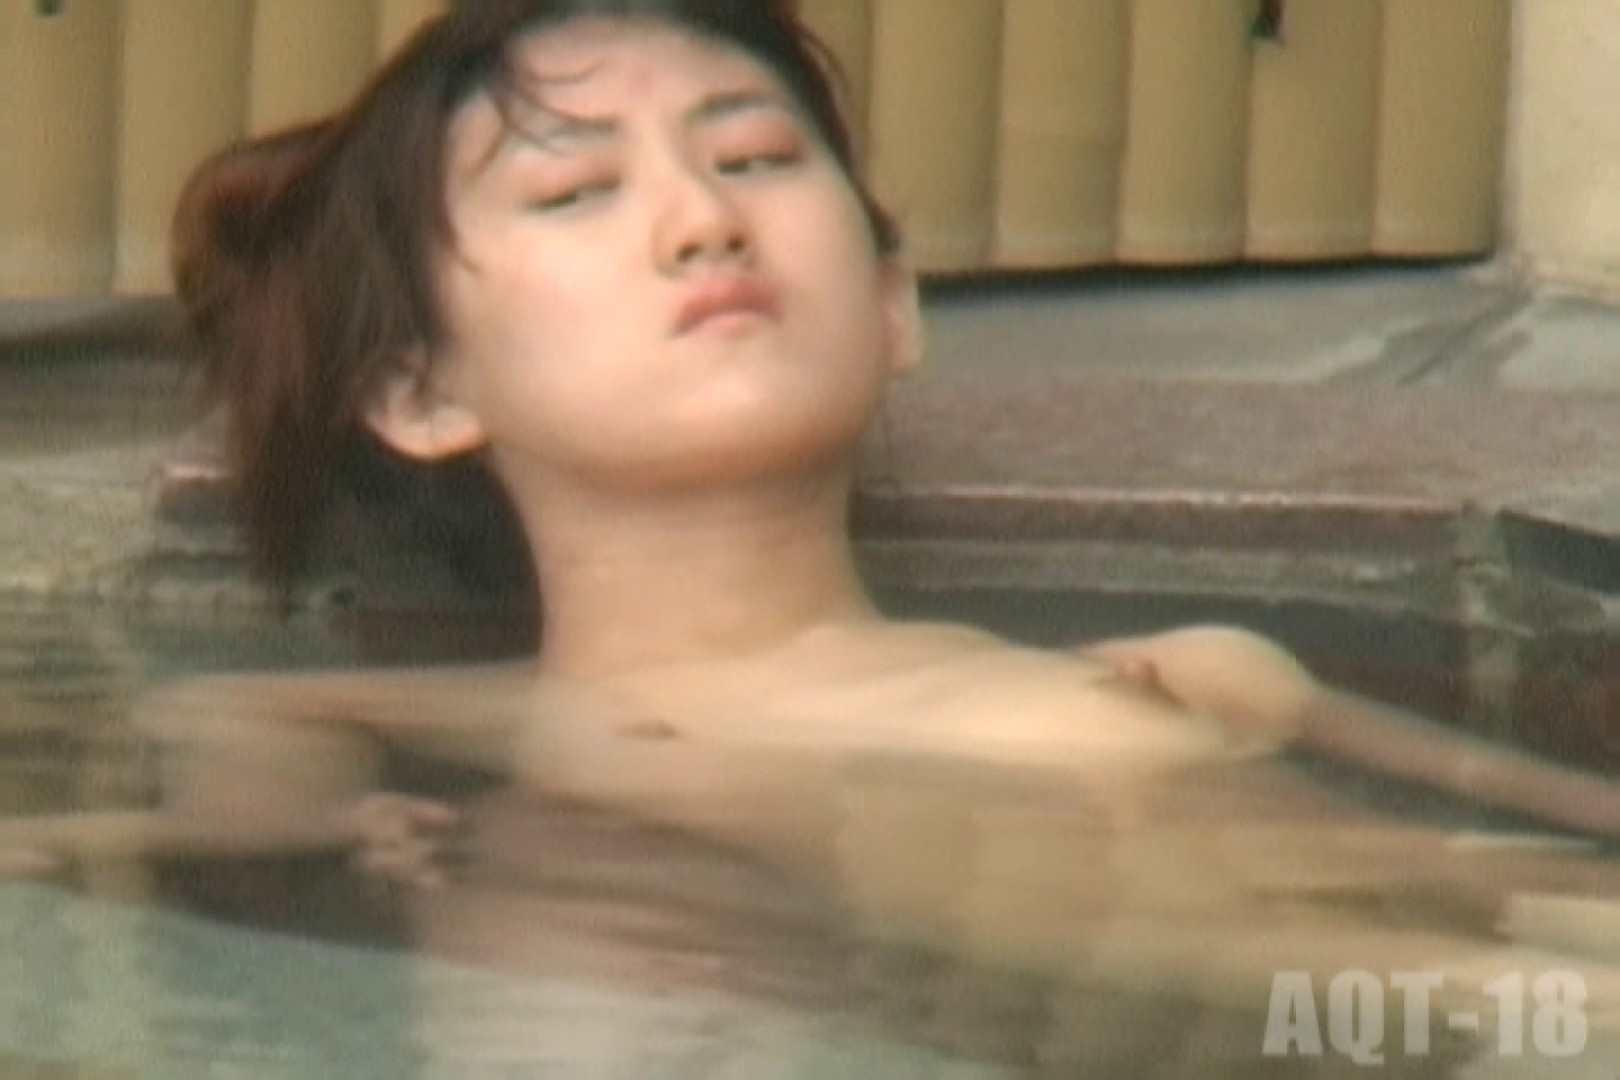 Aquaな露天風呂Vol.862 美しいOLの裸体 戯れ無修正画像 99pic 62